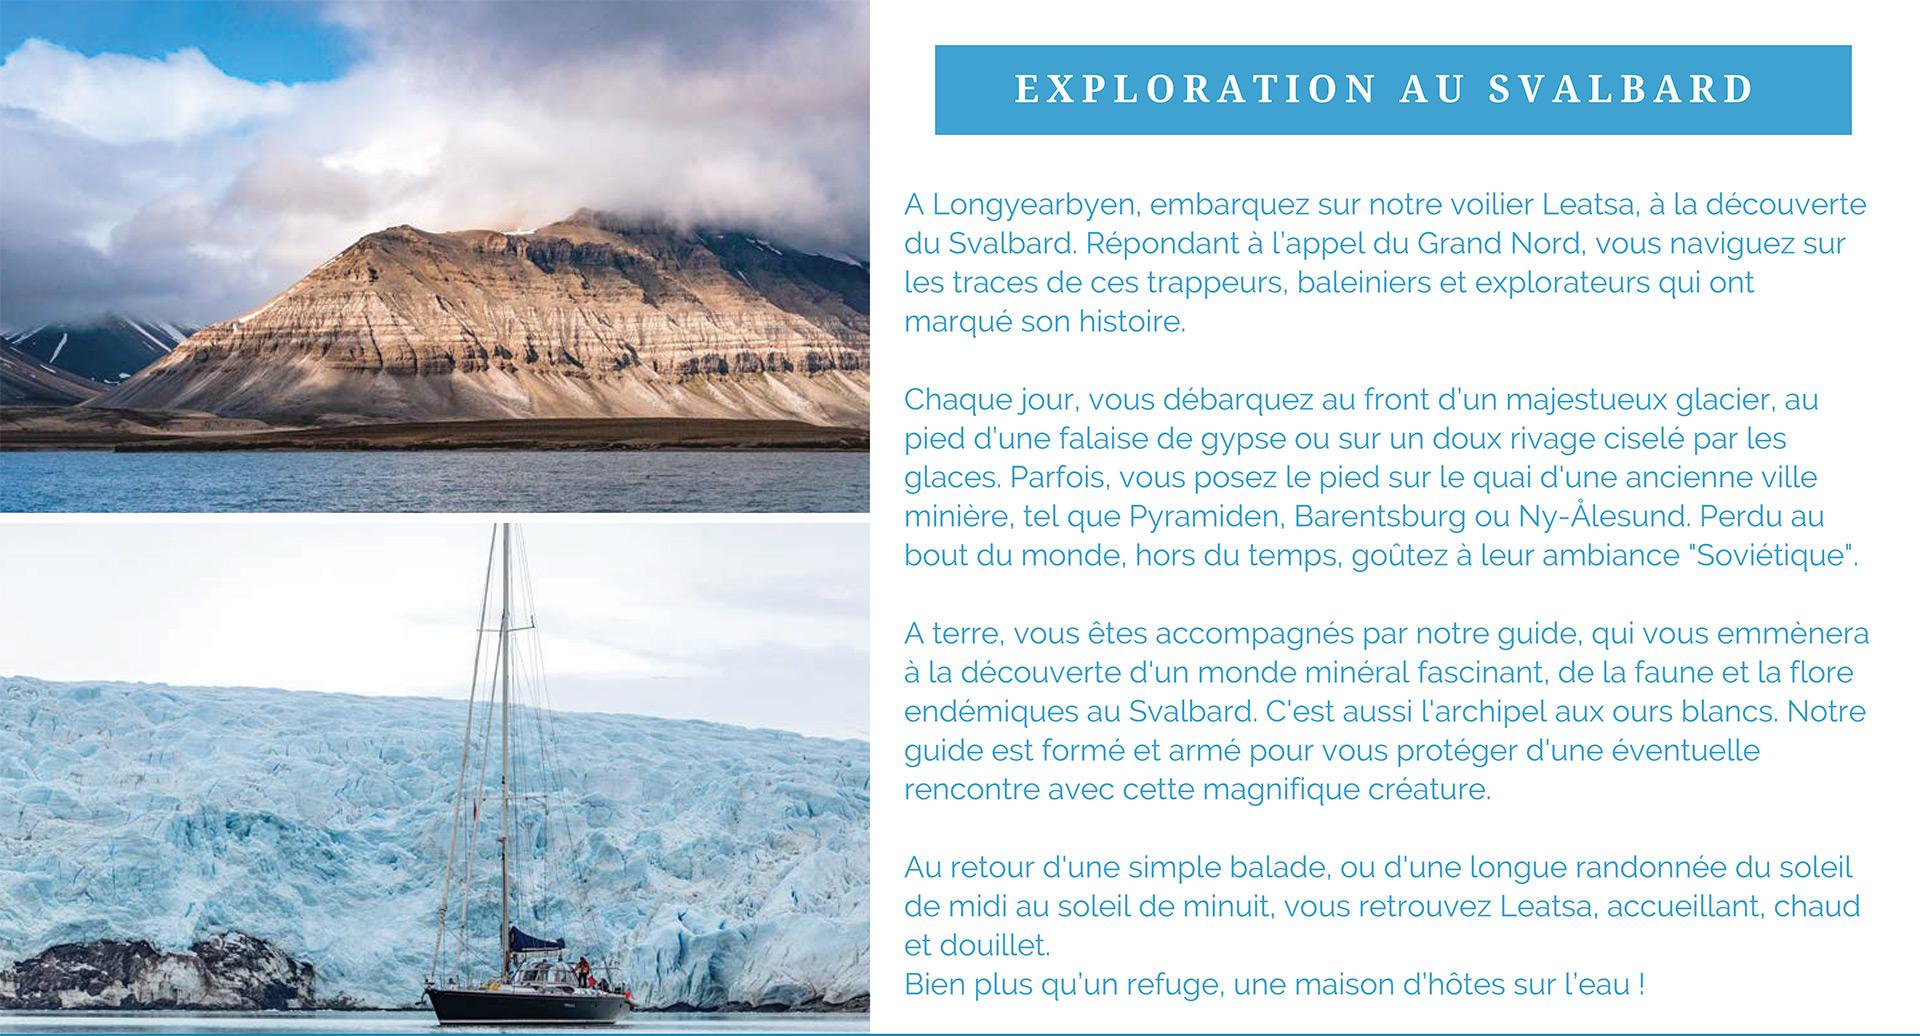 POLAR-SAILS_2019_Croisiere_Svalbard_v181105_FR-2